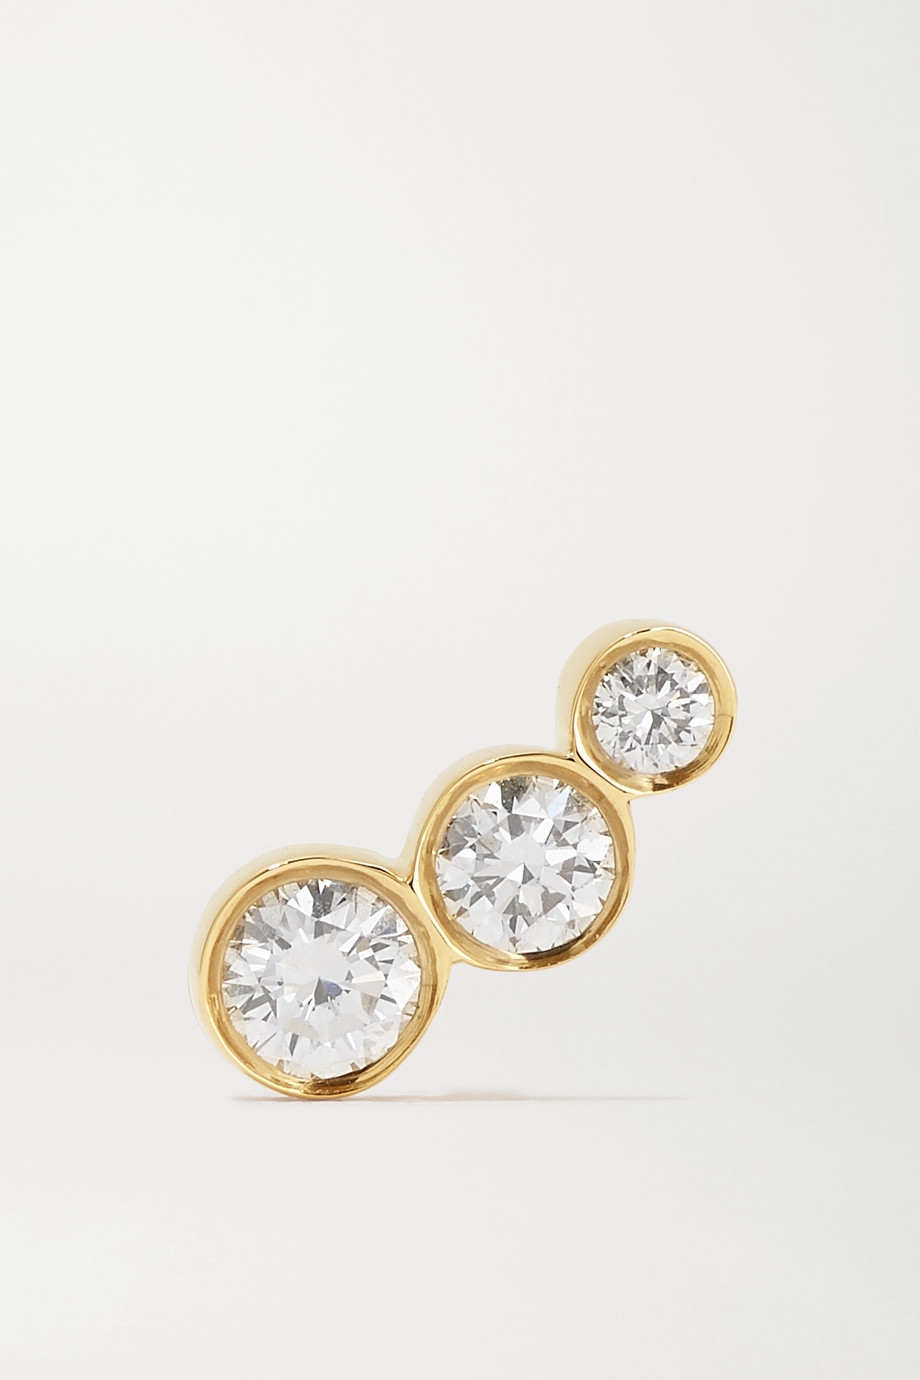 Sophie Bille Brahe Croissant Trois 18-karat gold diamond earring